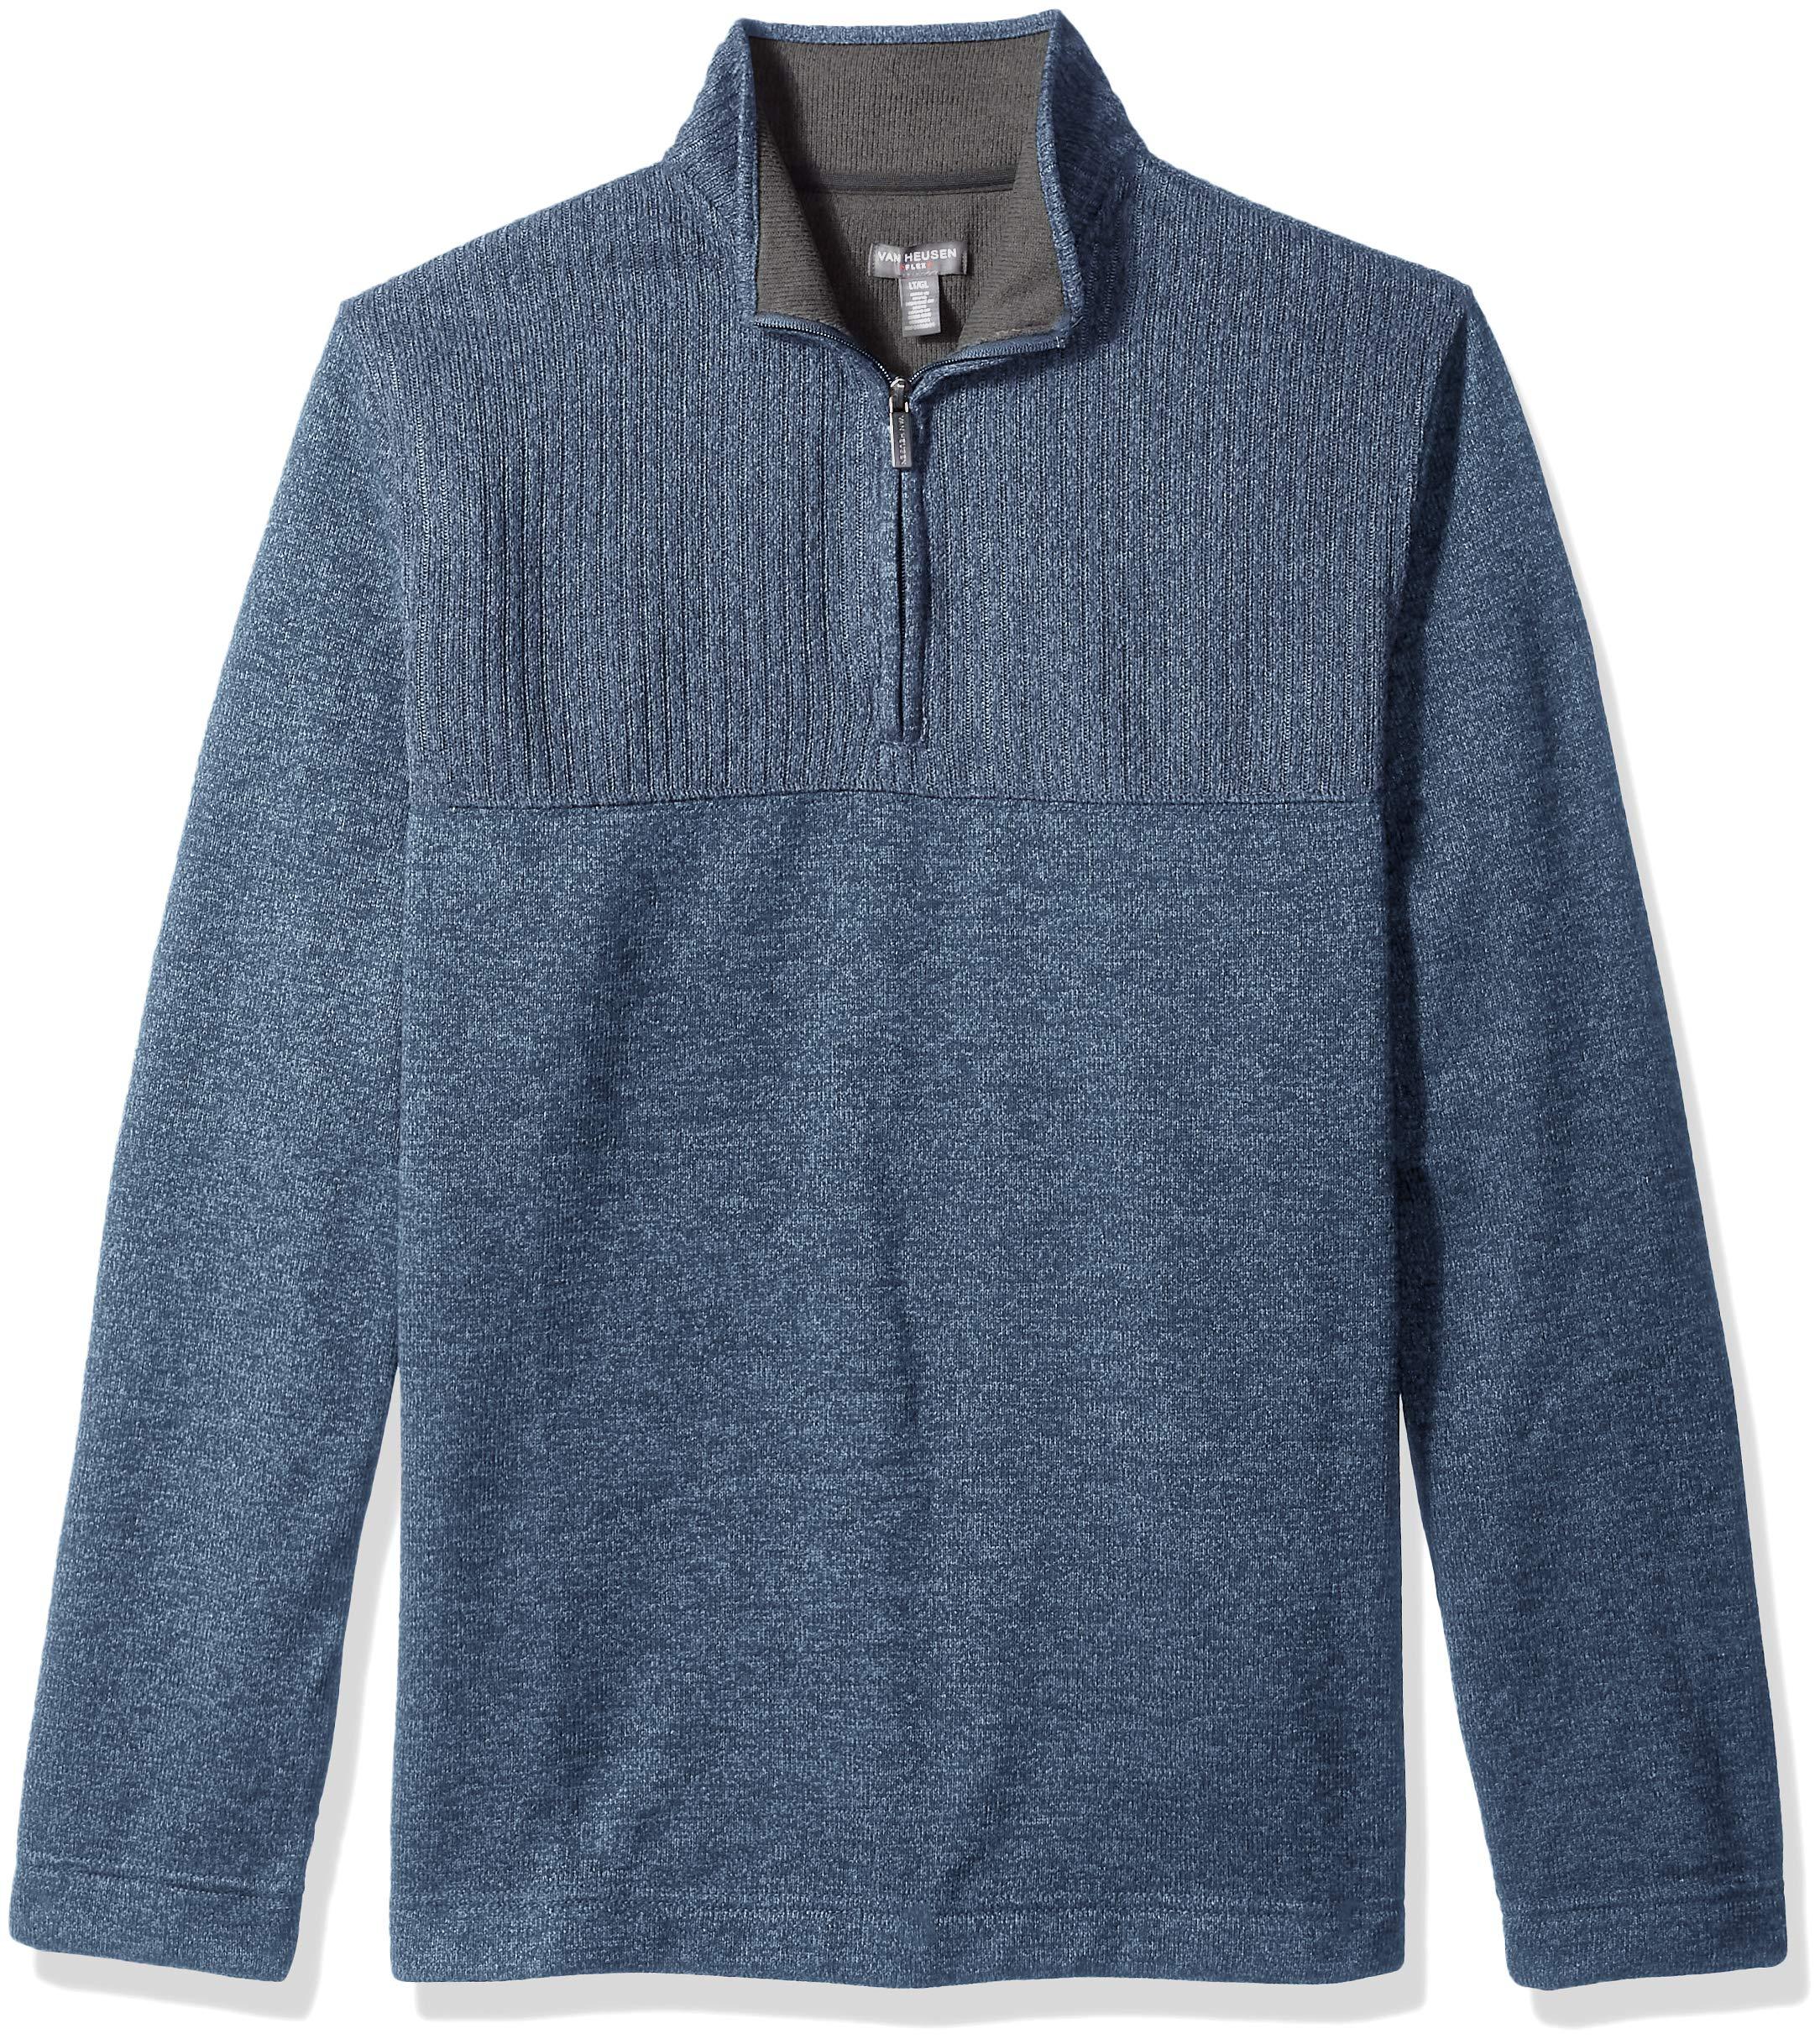 Van Heusen Men's Big and Tall Flex 1/4-zip Solid Sweater, blue forever blue, 2X-Large Big